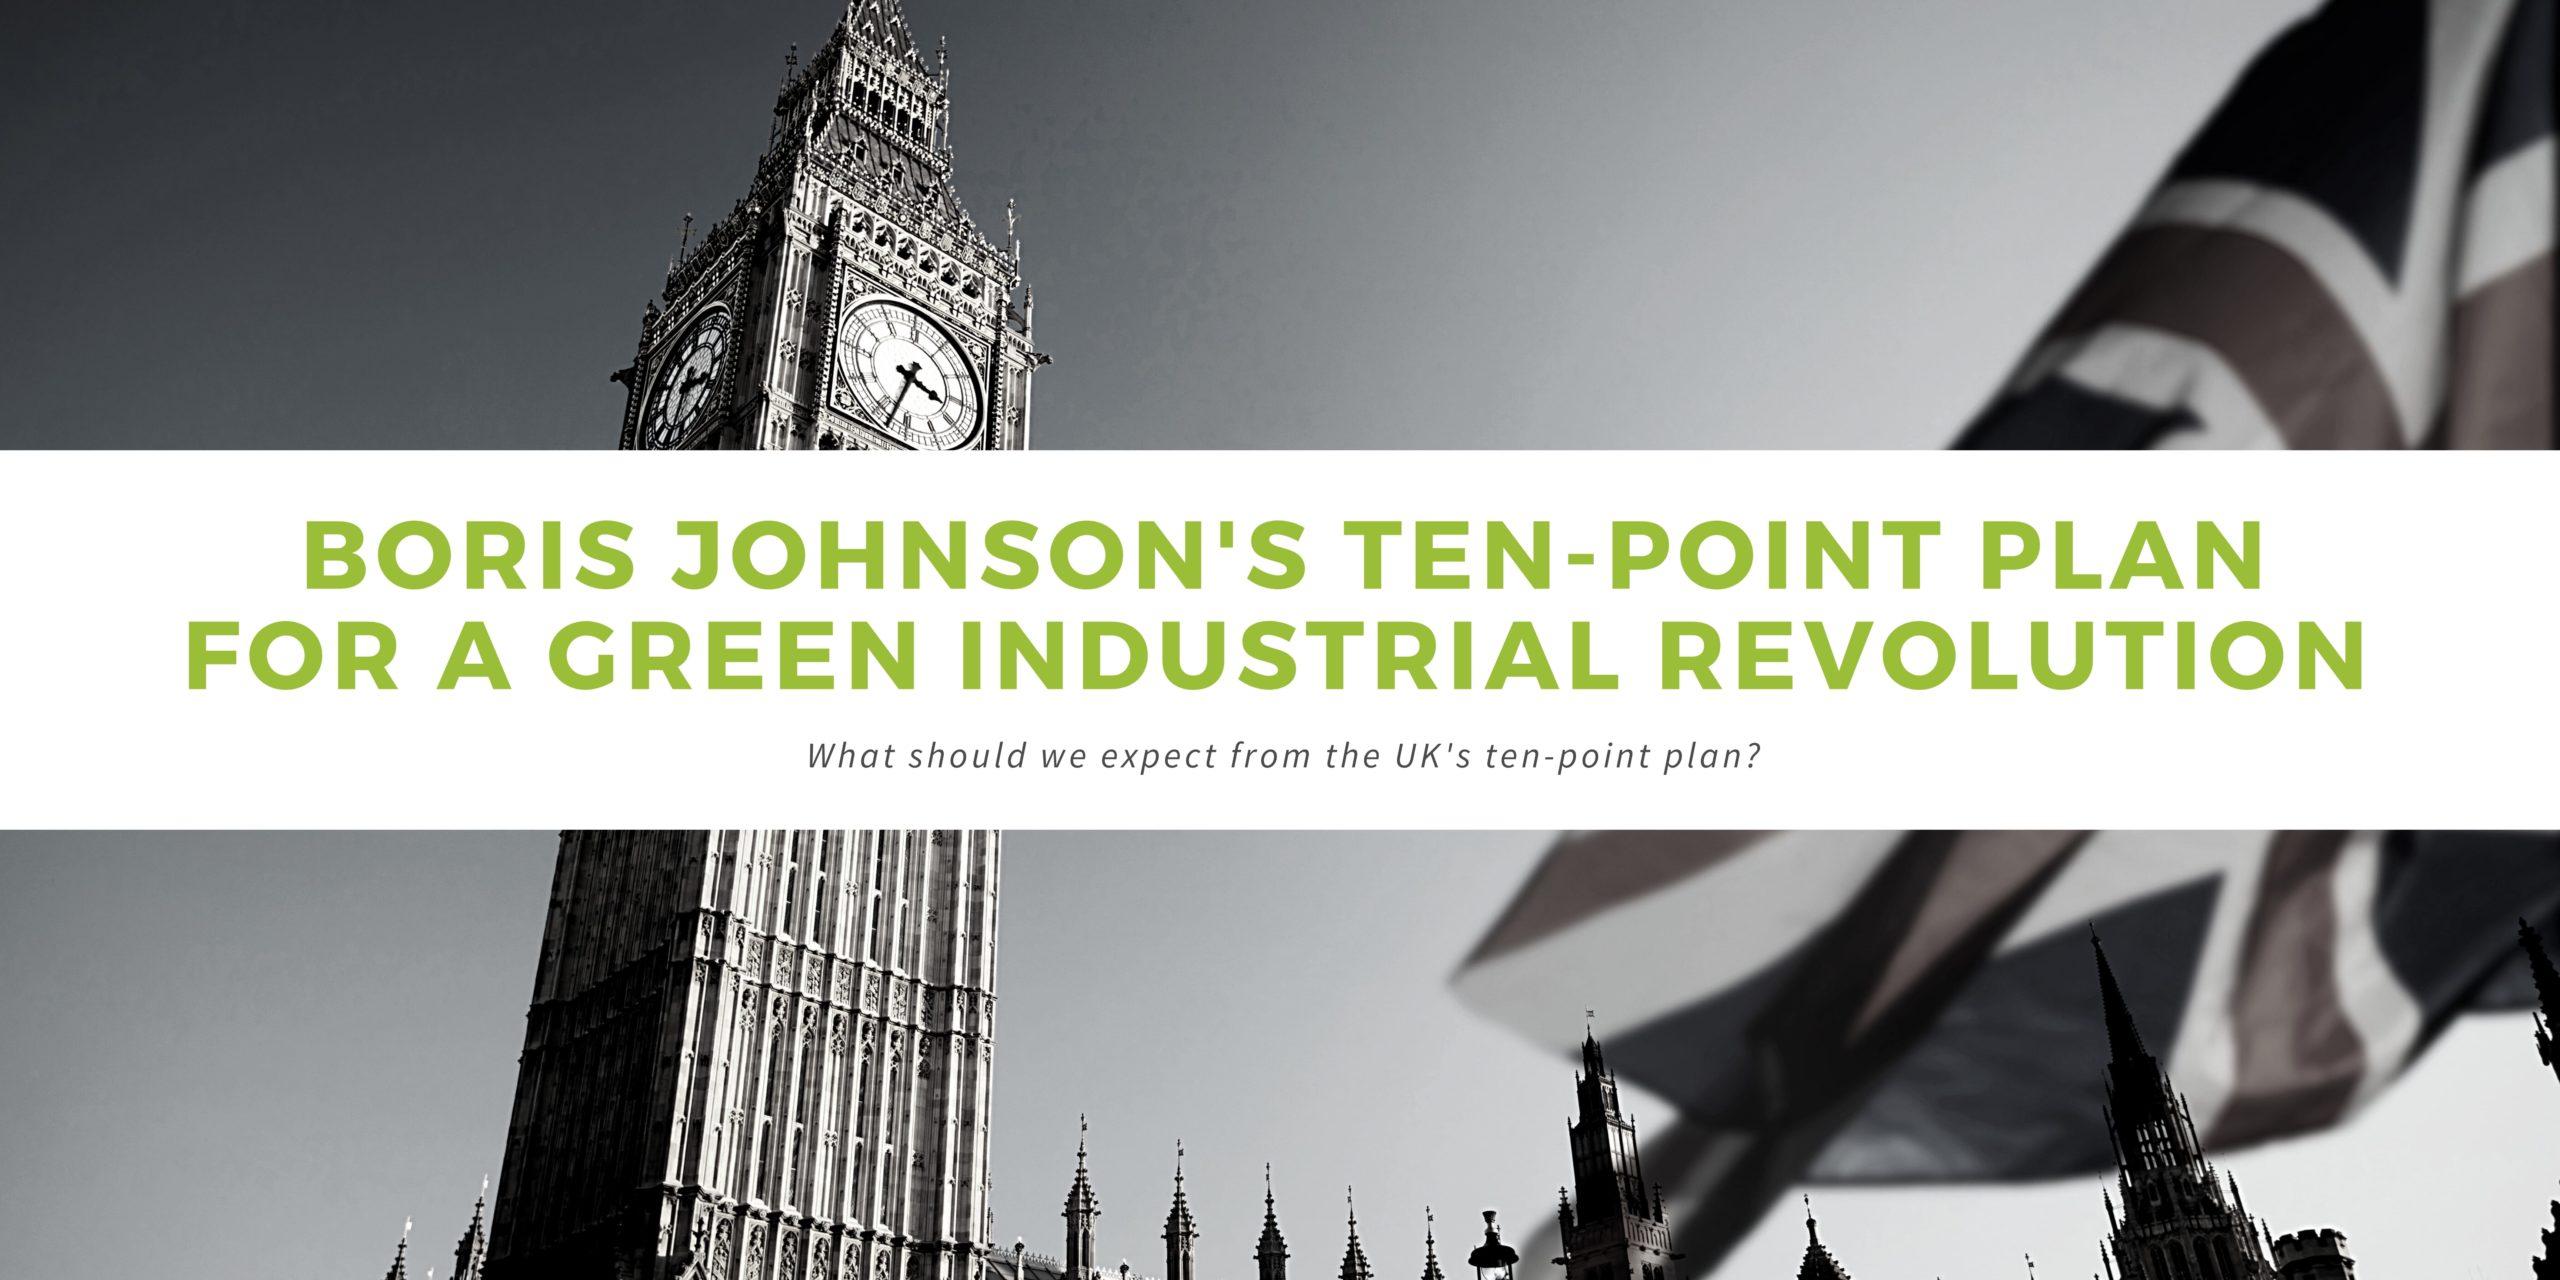 Boris Johnson's 10 point plan for a green revolution